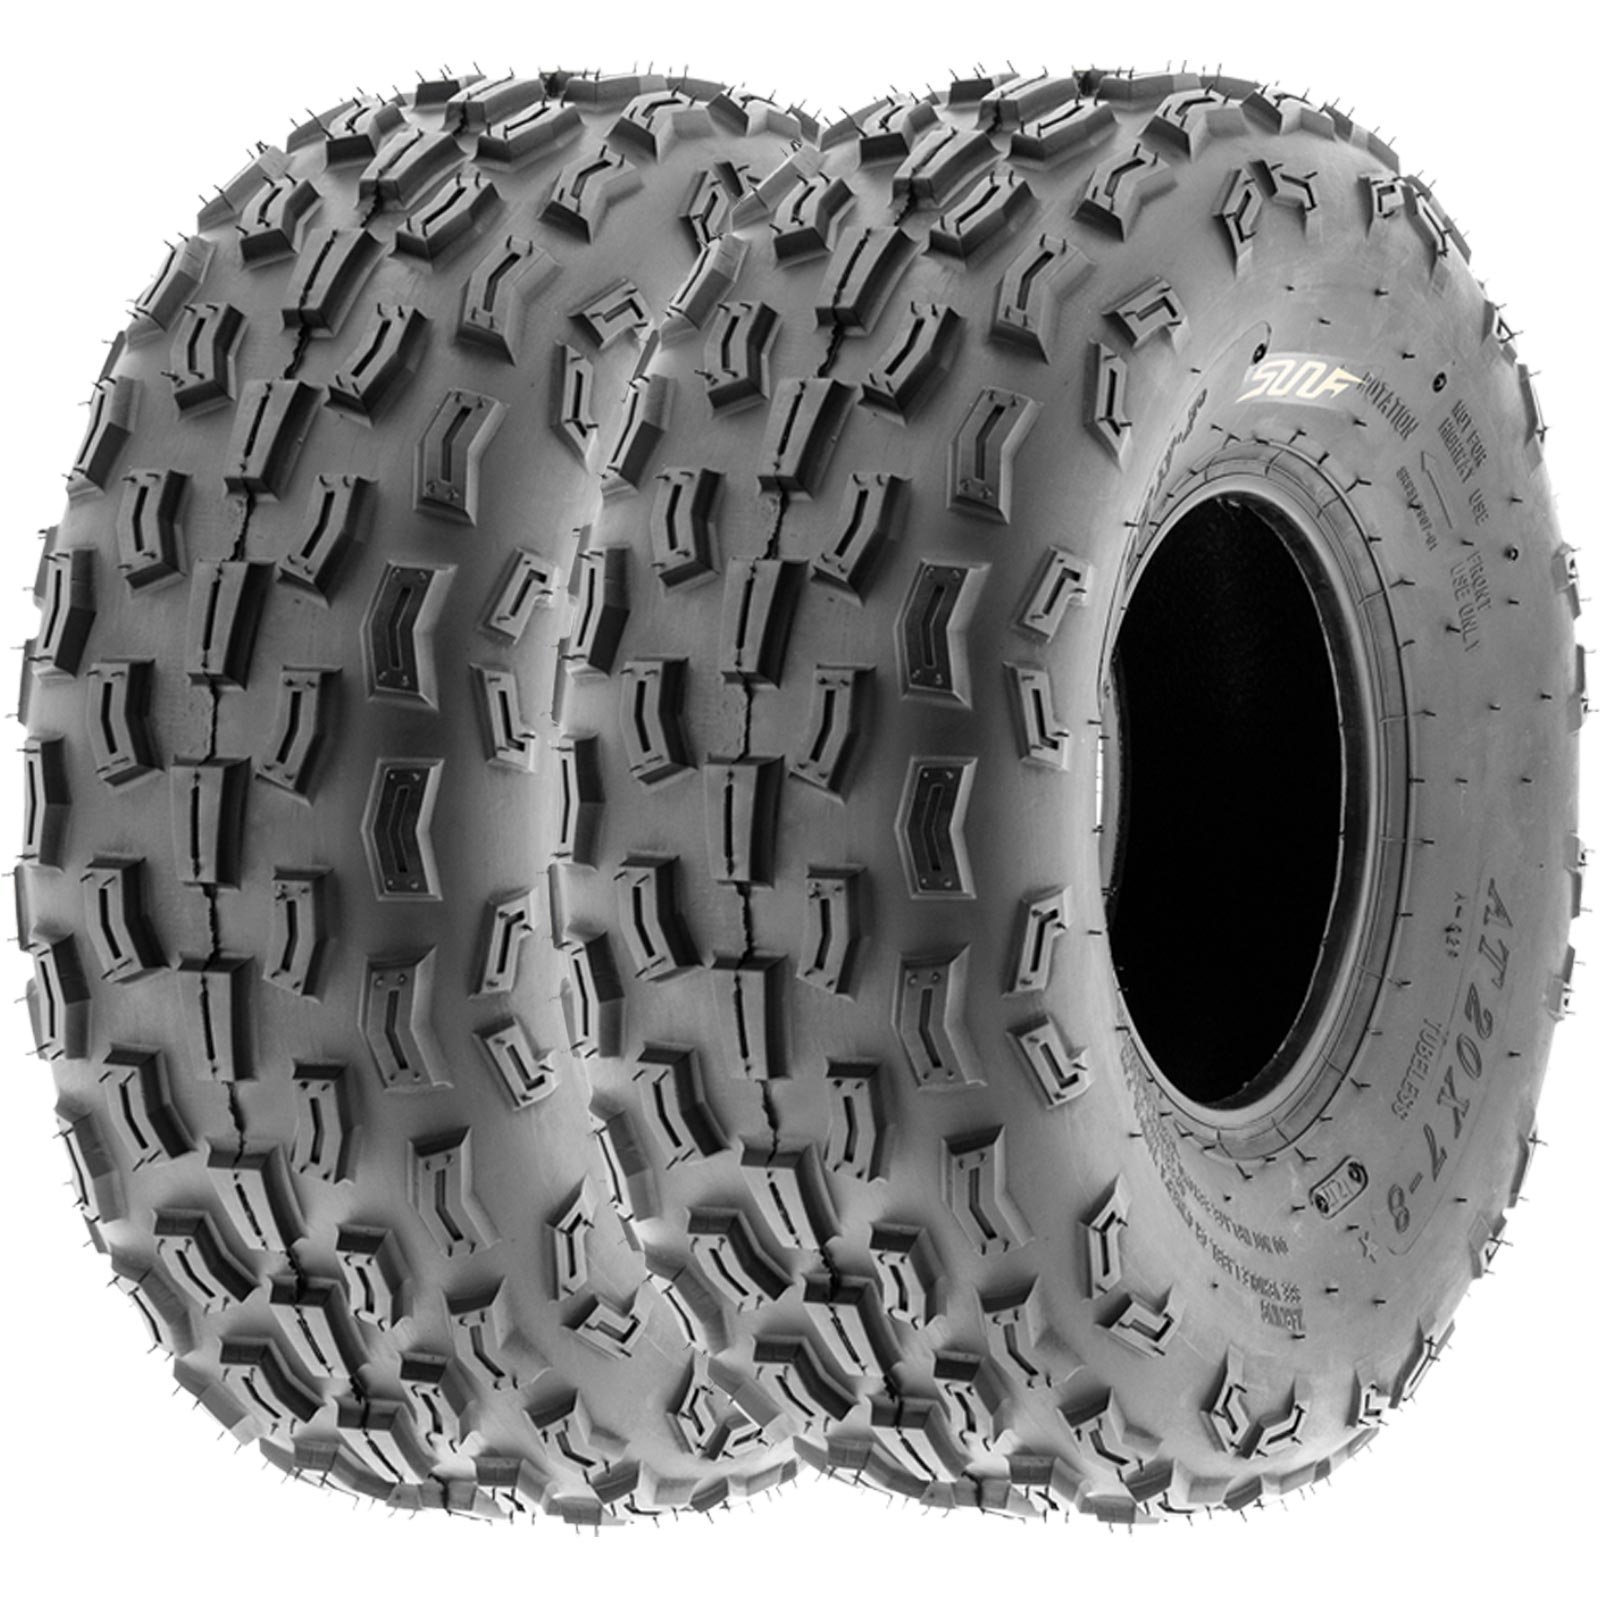 SunF 20x7-8 20x7x8 ATV UTV A/T Knobby Race Replacement 6 PR Tubeless Tires A029, [Set of 2]